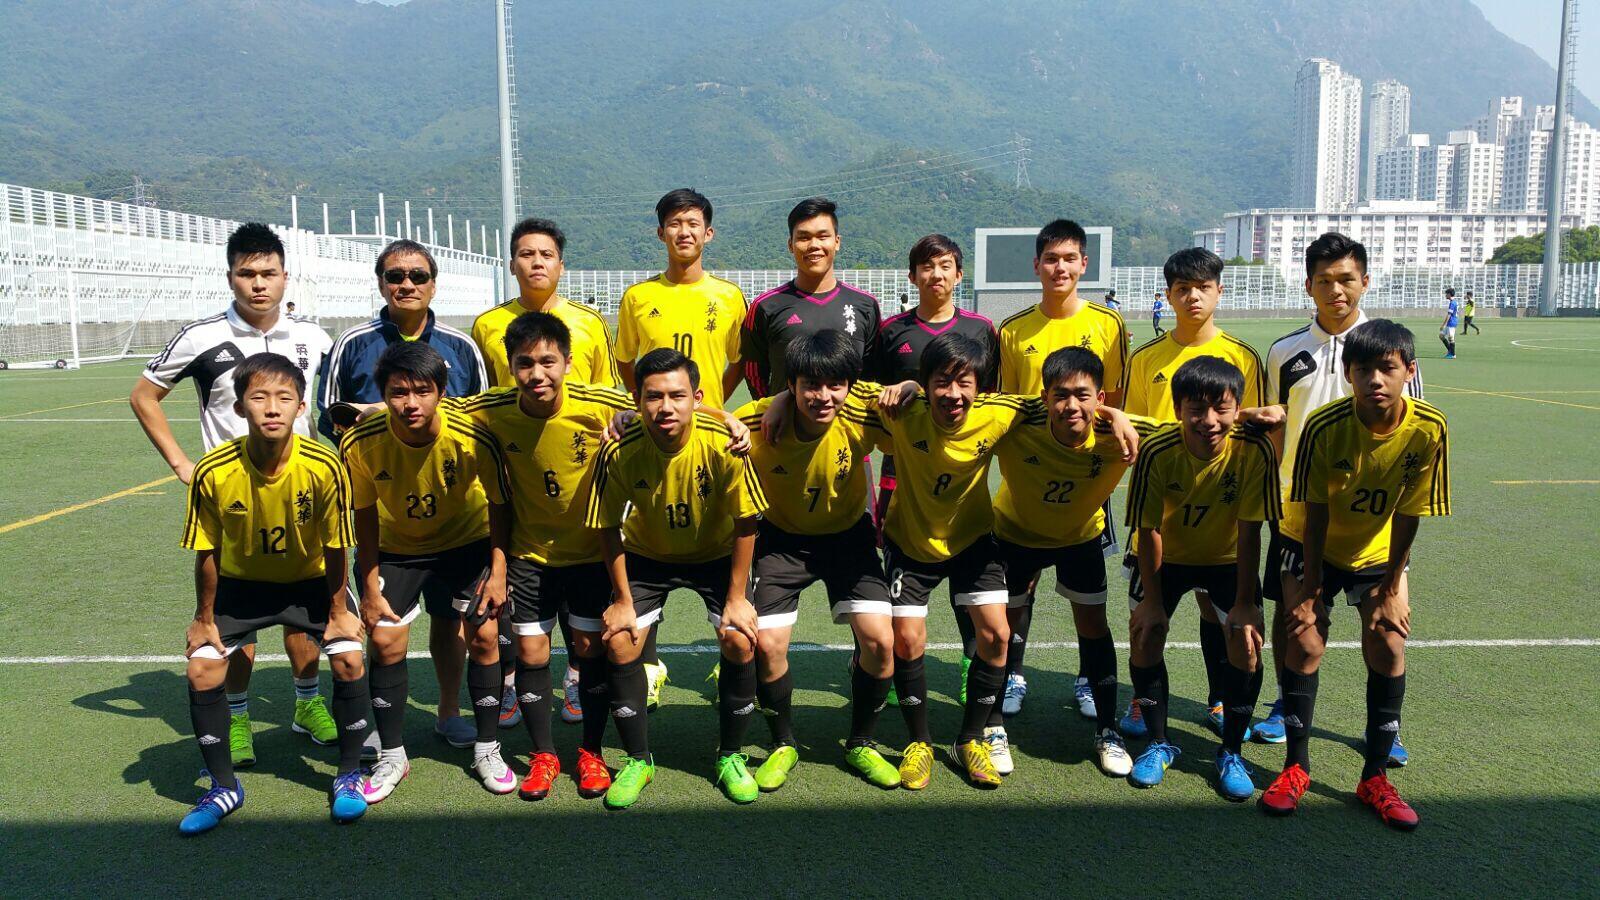 Ying Wa Football Team